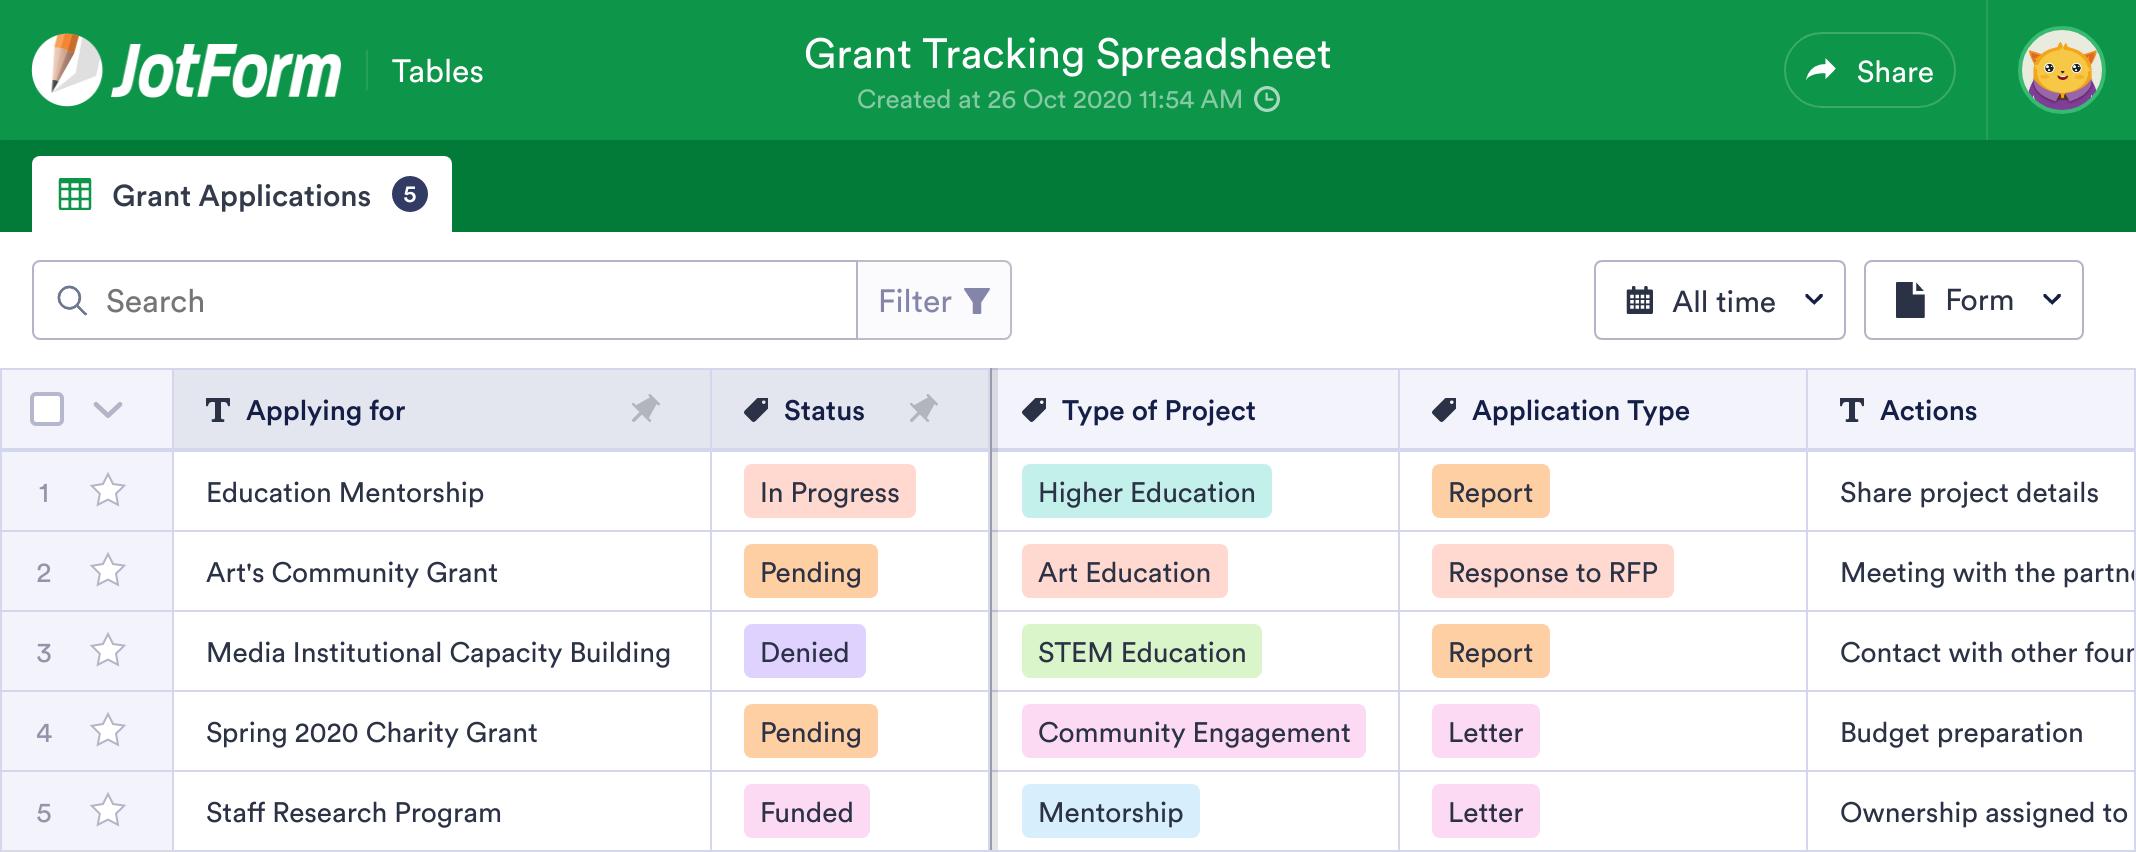 Grant Tracking Spreadsheet